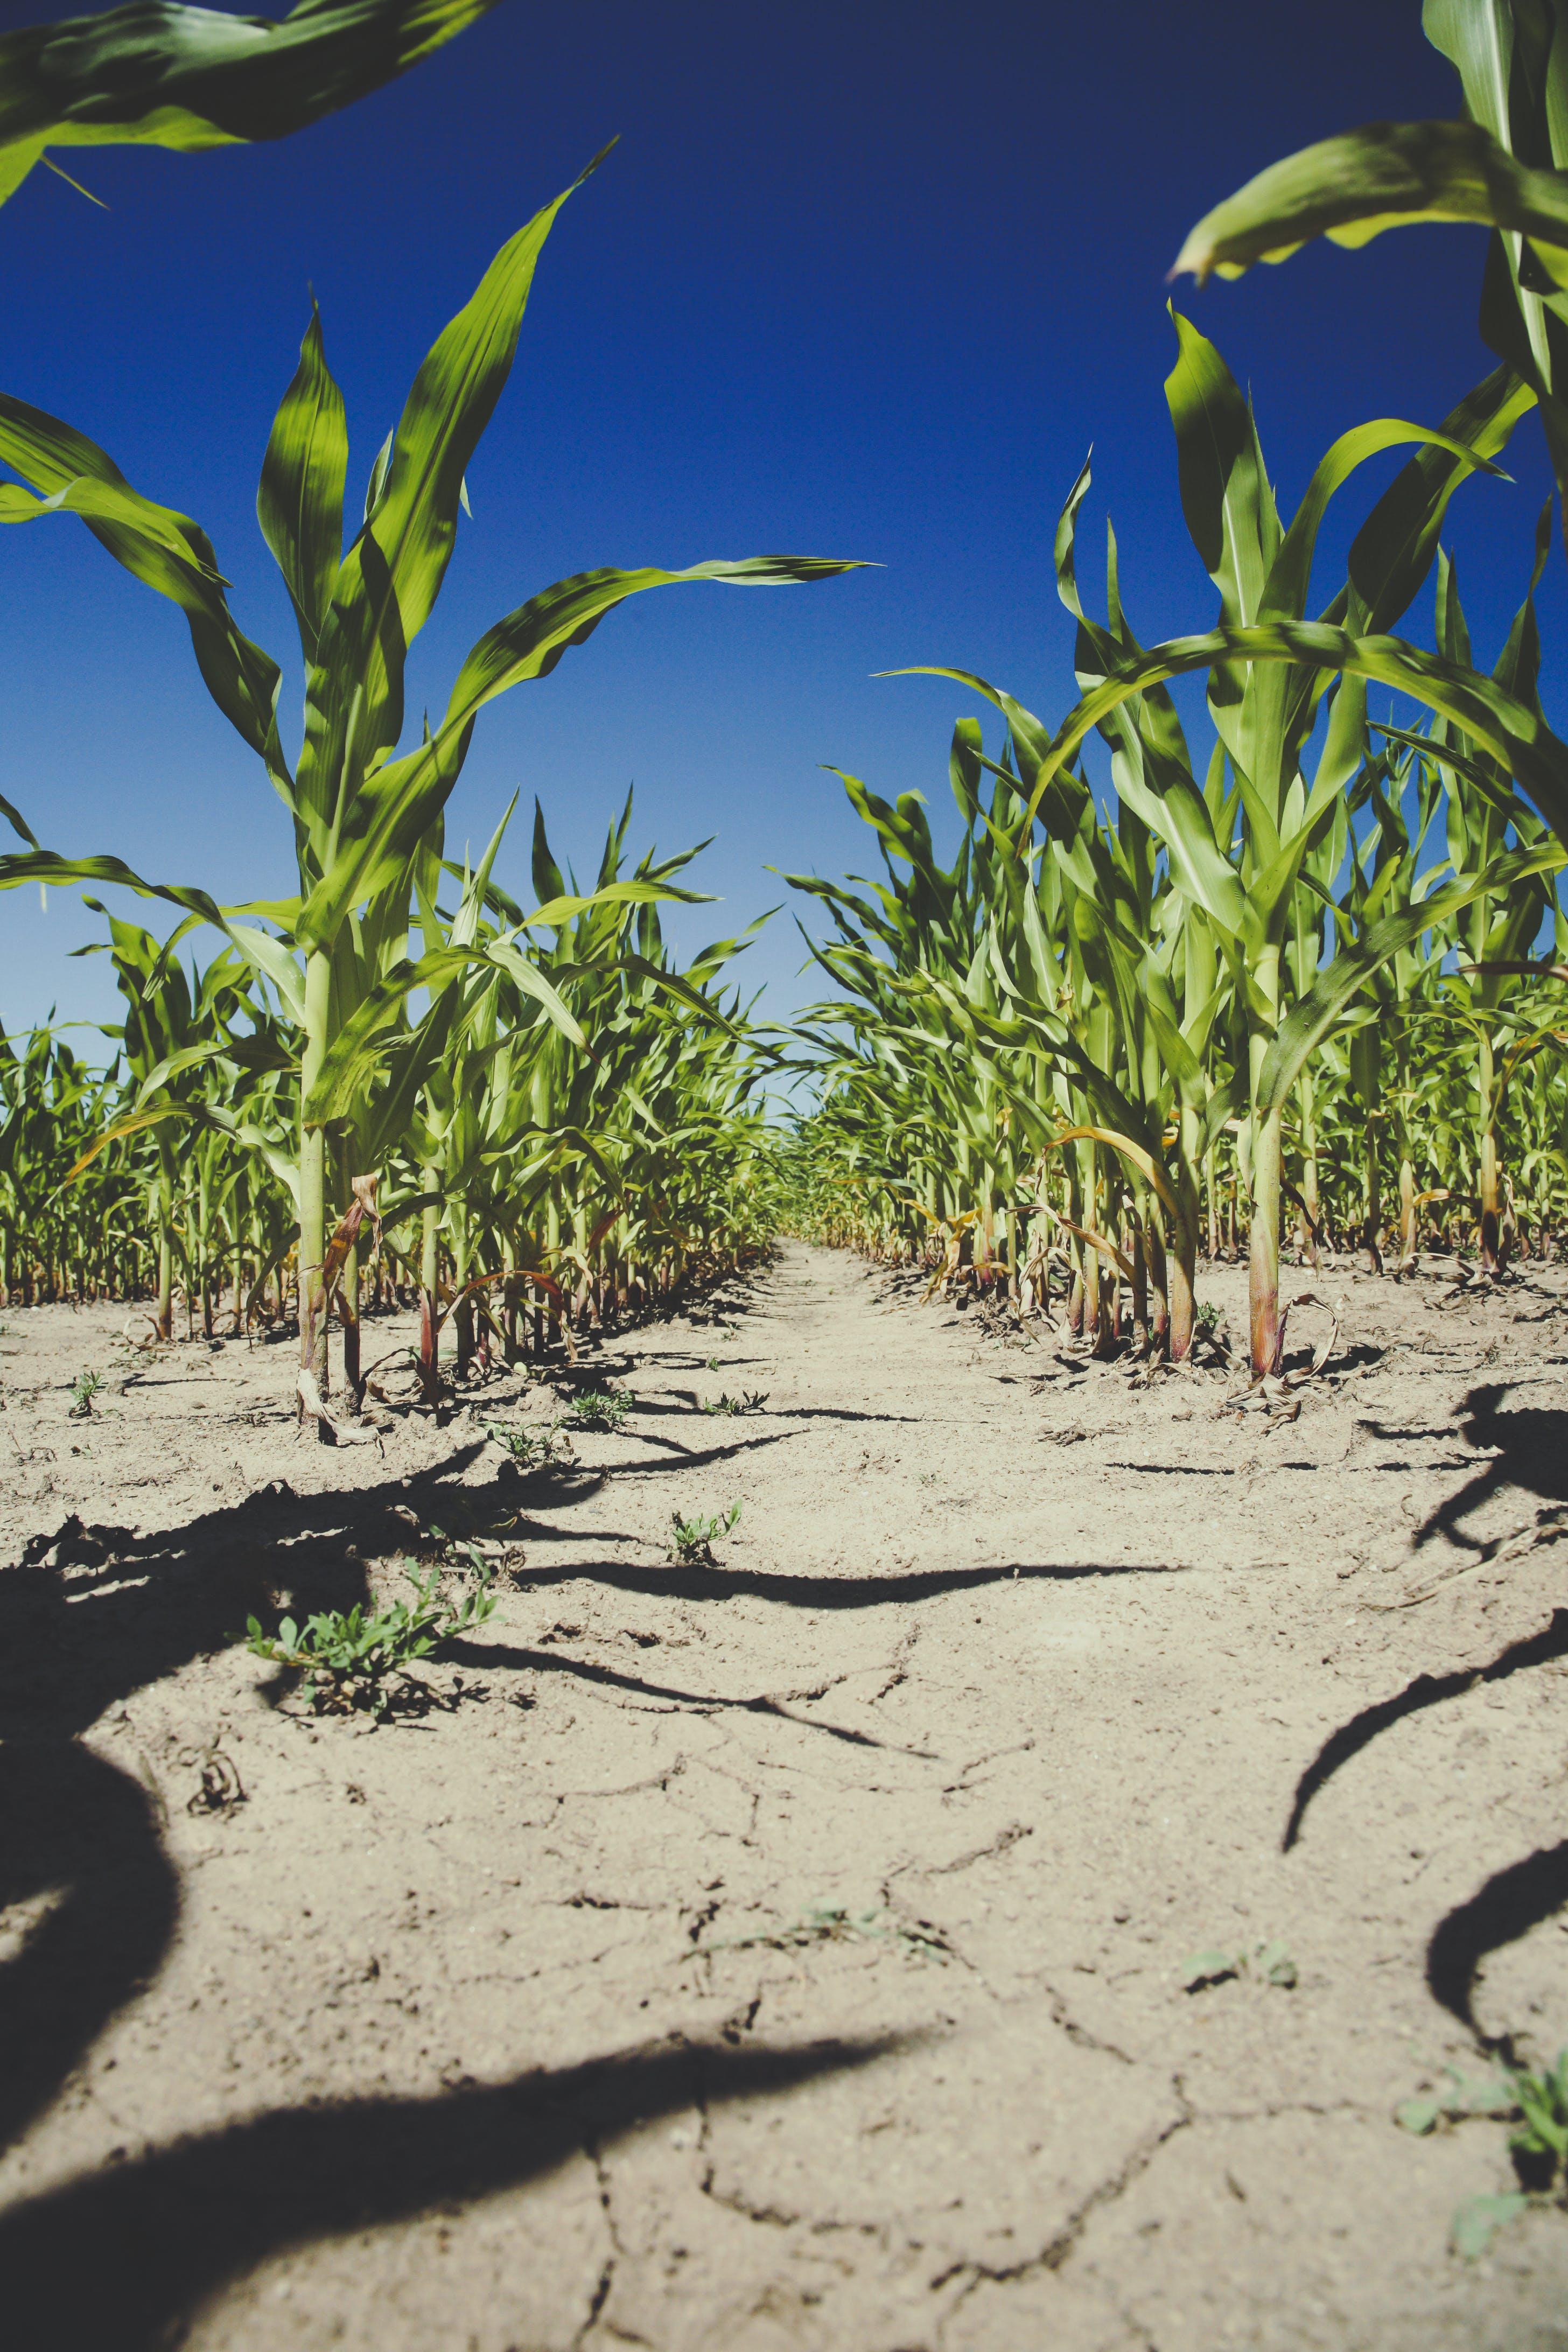 Corn Plantation Under Blue Sky during Daytime